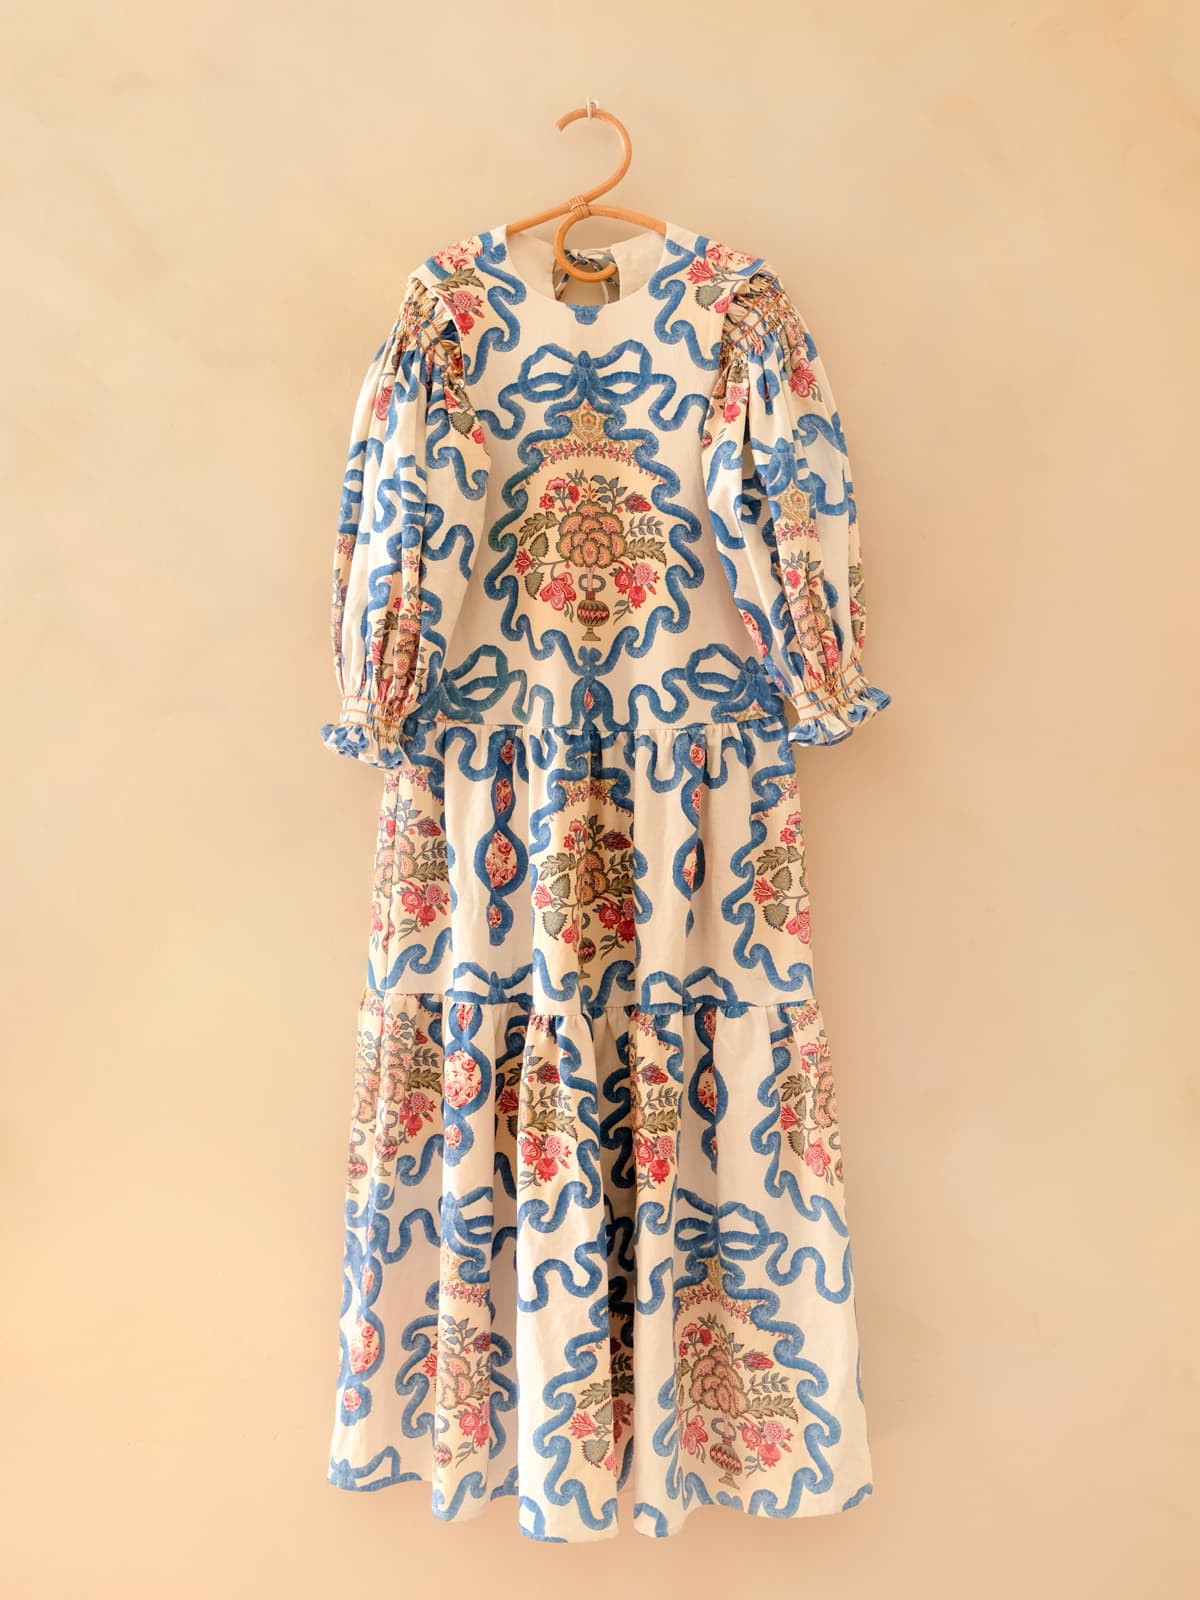 modular pomegranate dress